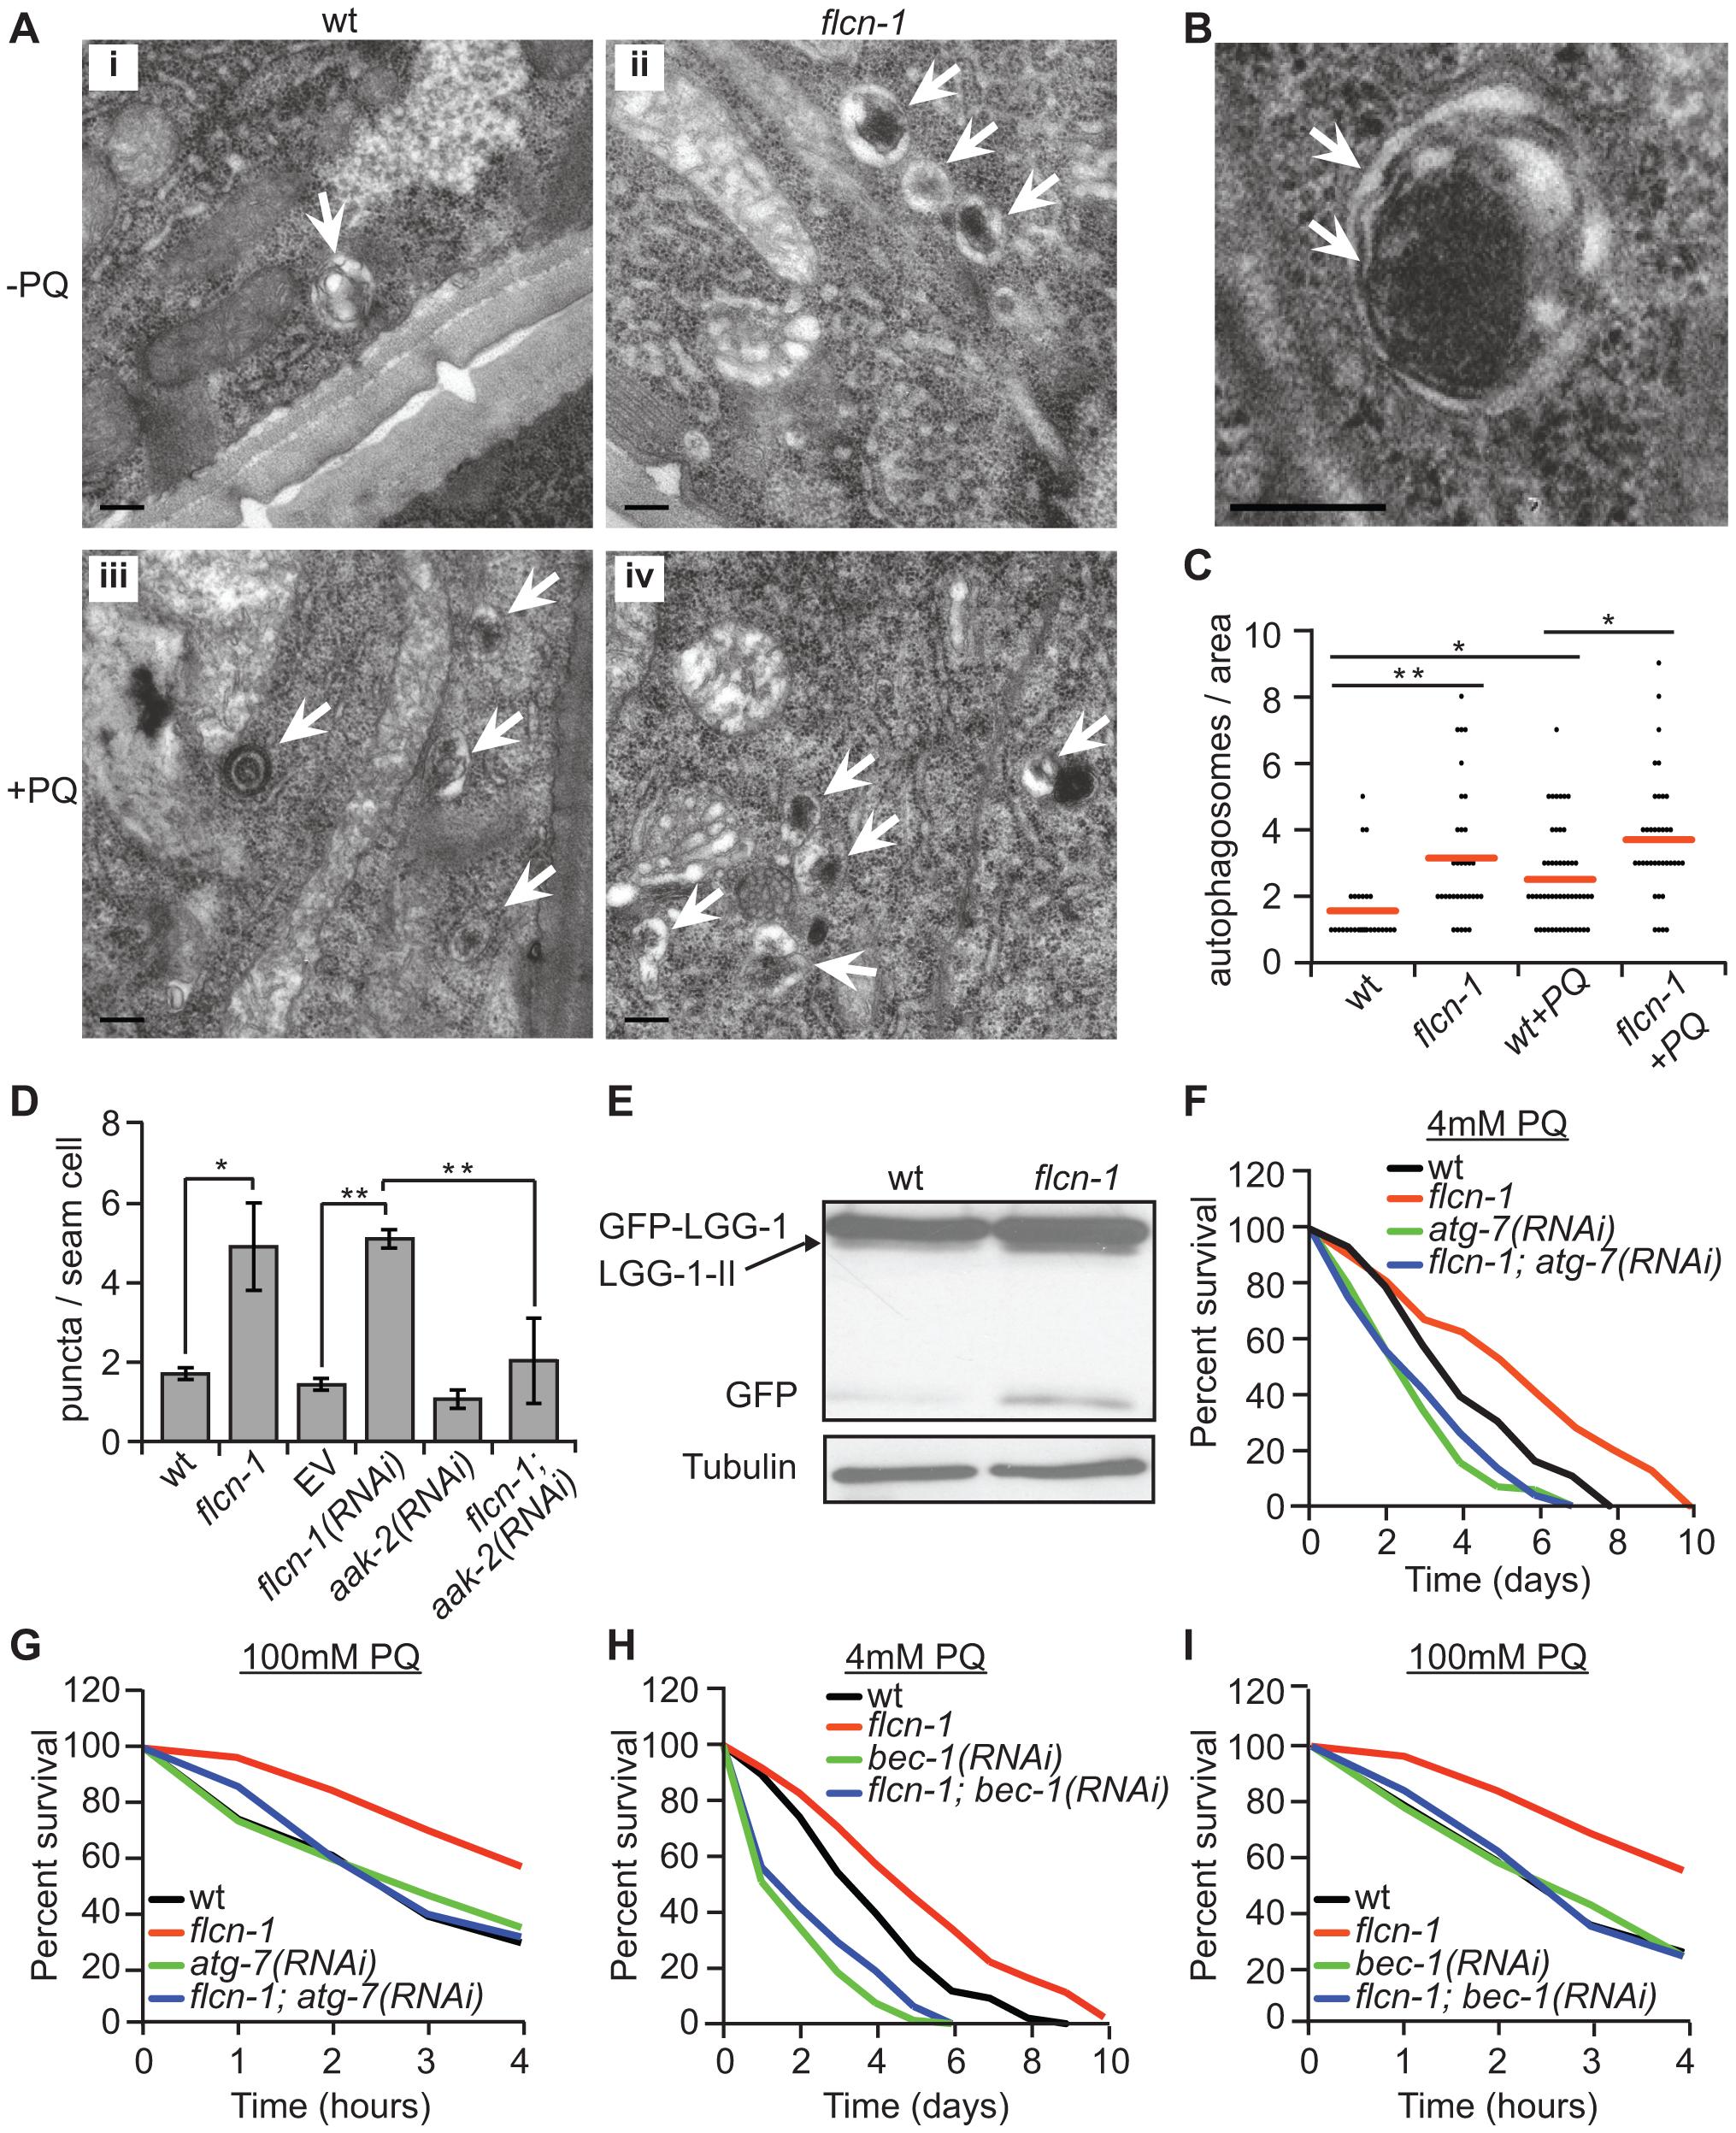 Loss of <i>flcn-1</i> activates autophagy resulting in oxidative stress resistance in <i>C. elegans</i>.